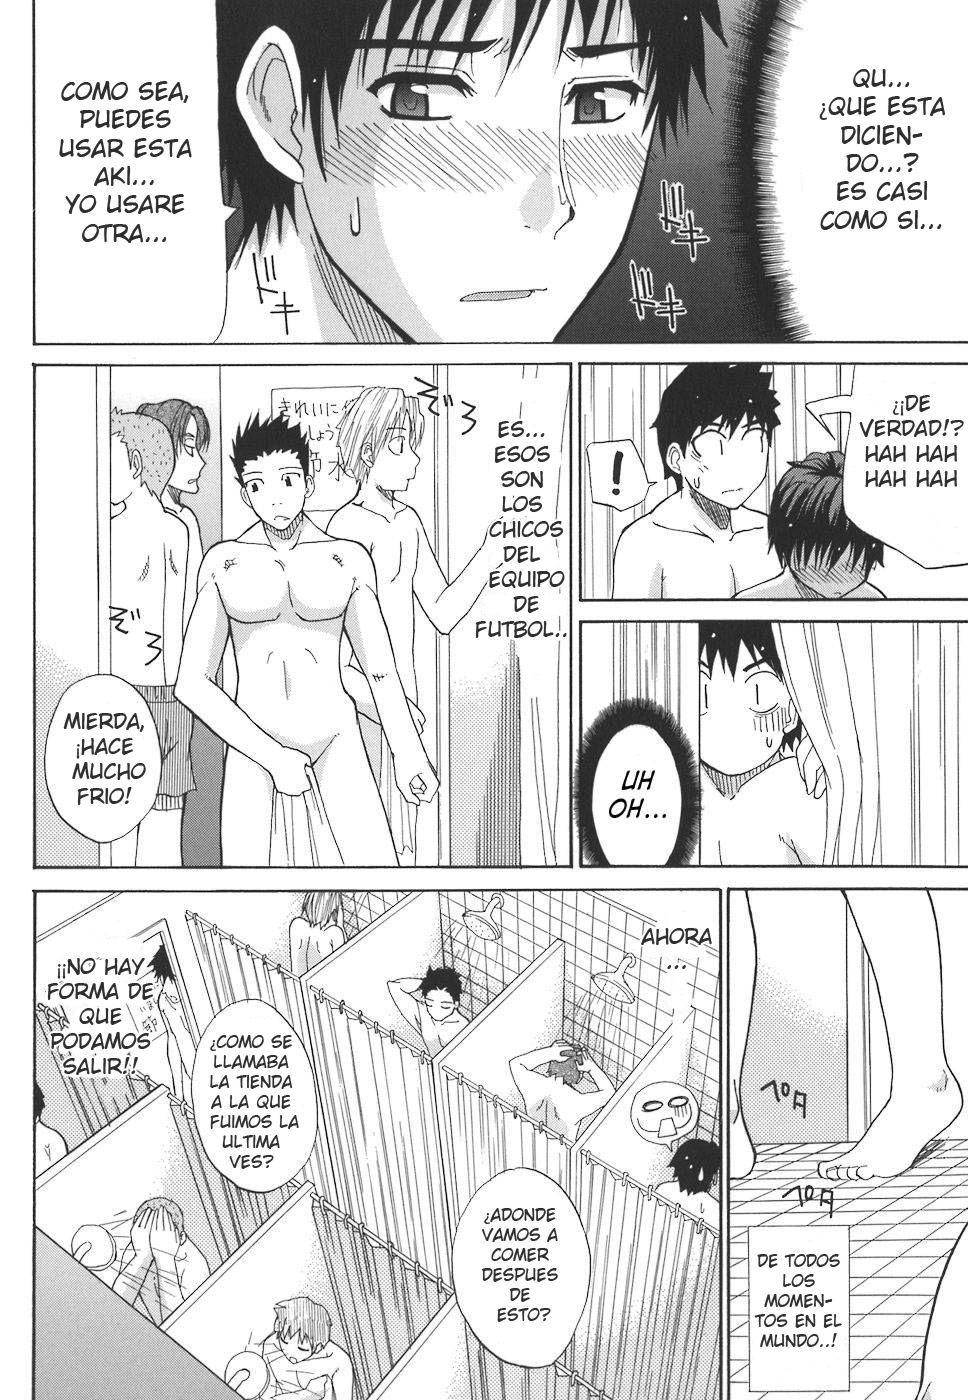 Ichizu na Toriko - A Earnest Captive [Capítulo 1-2]